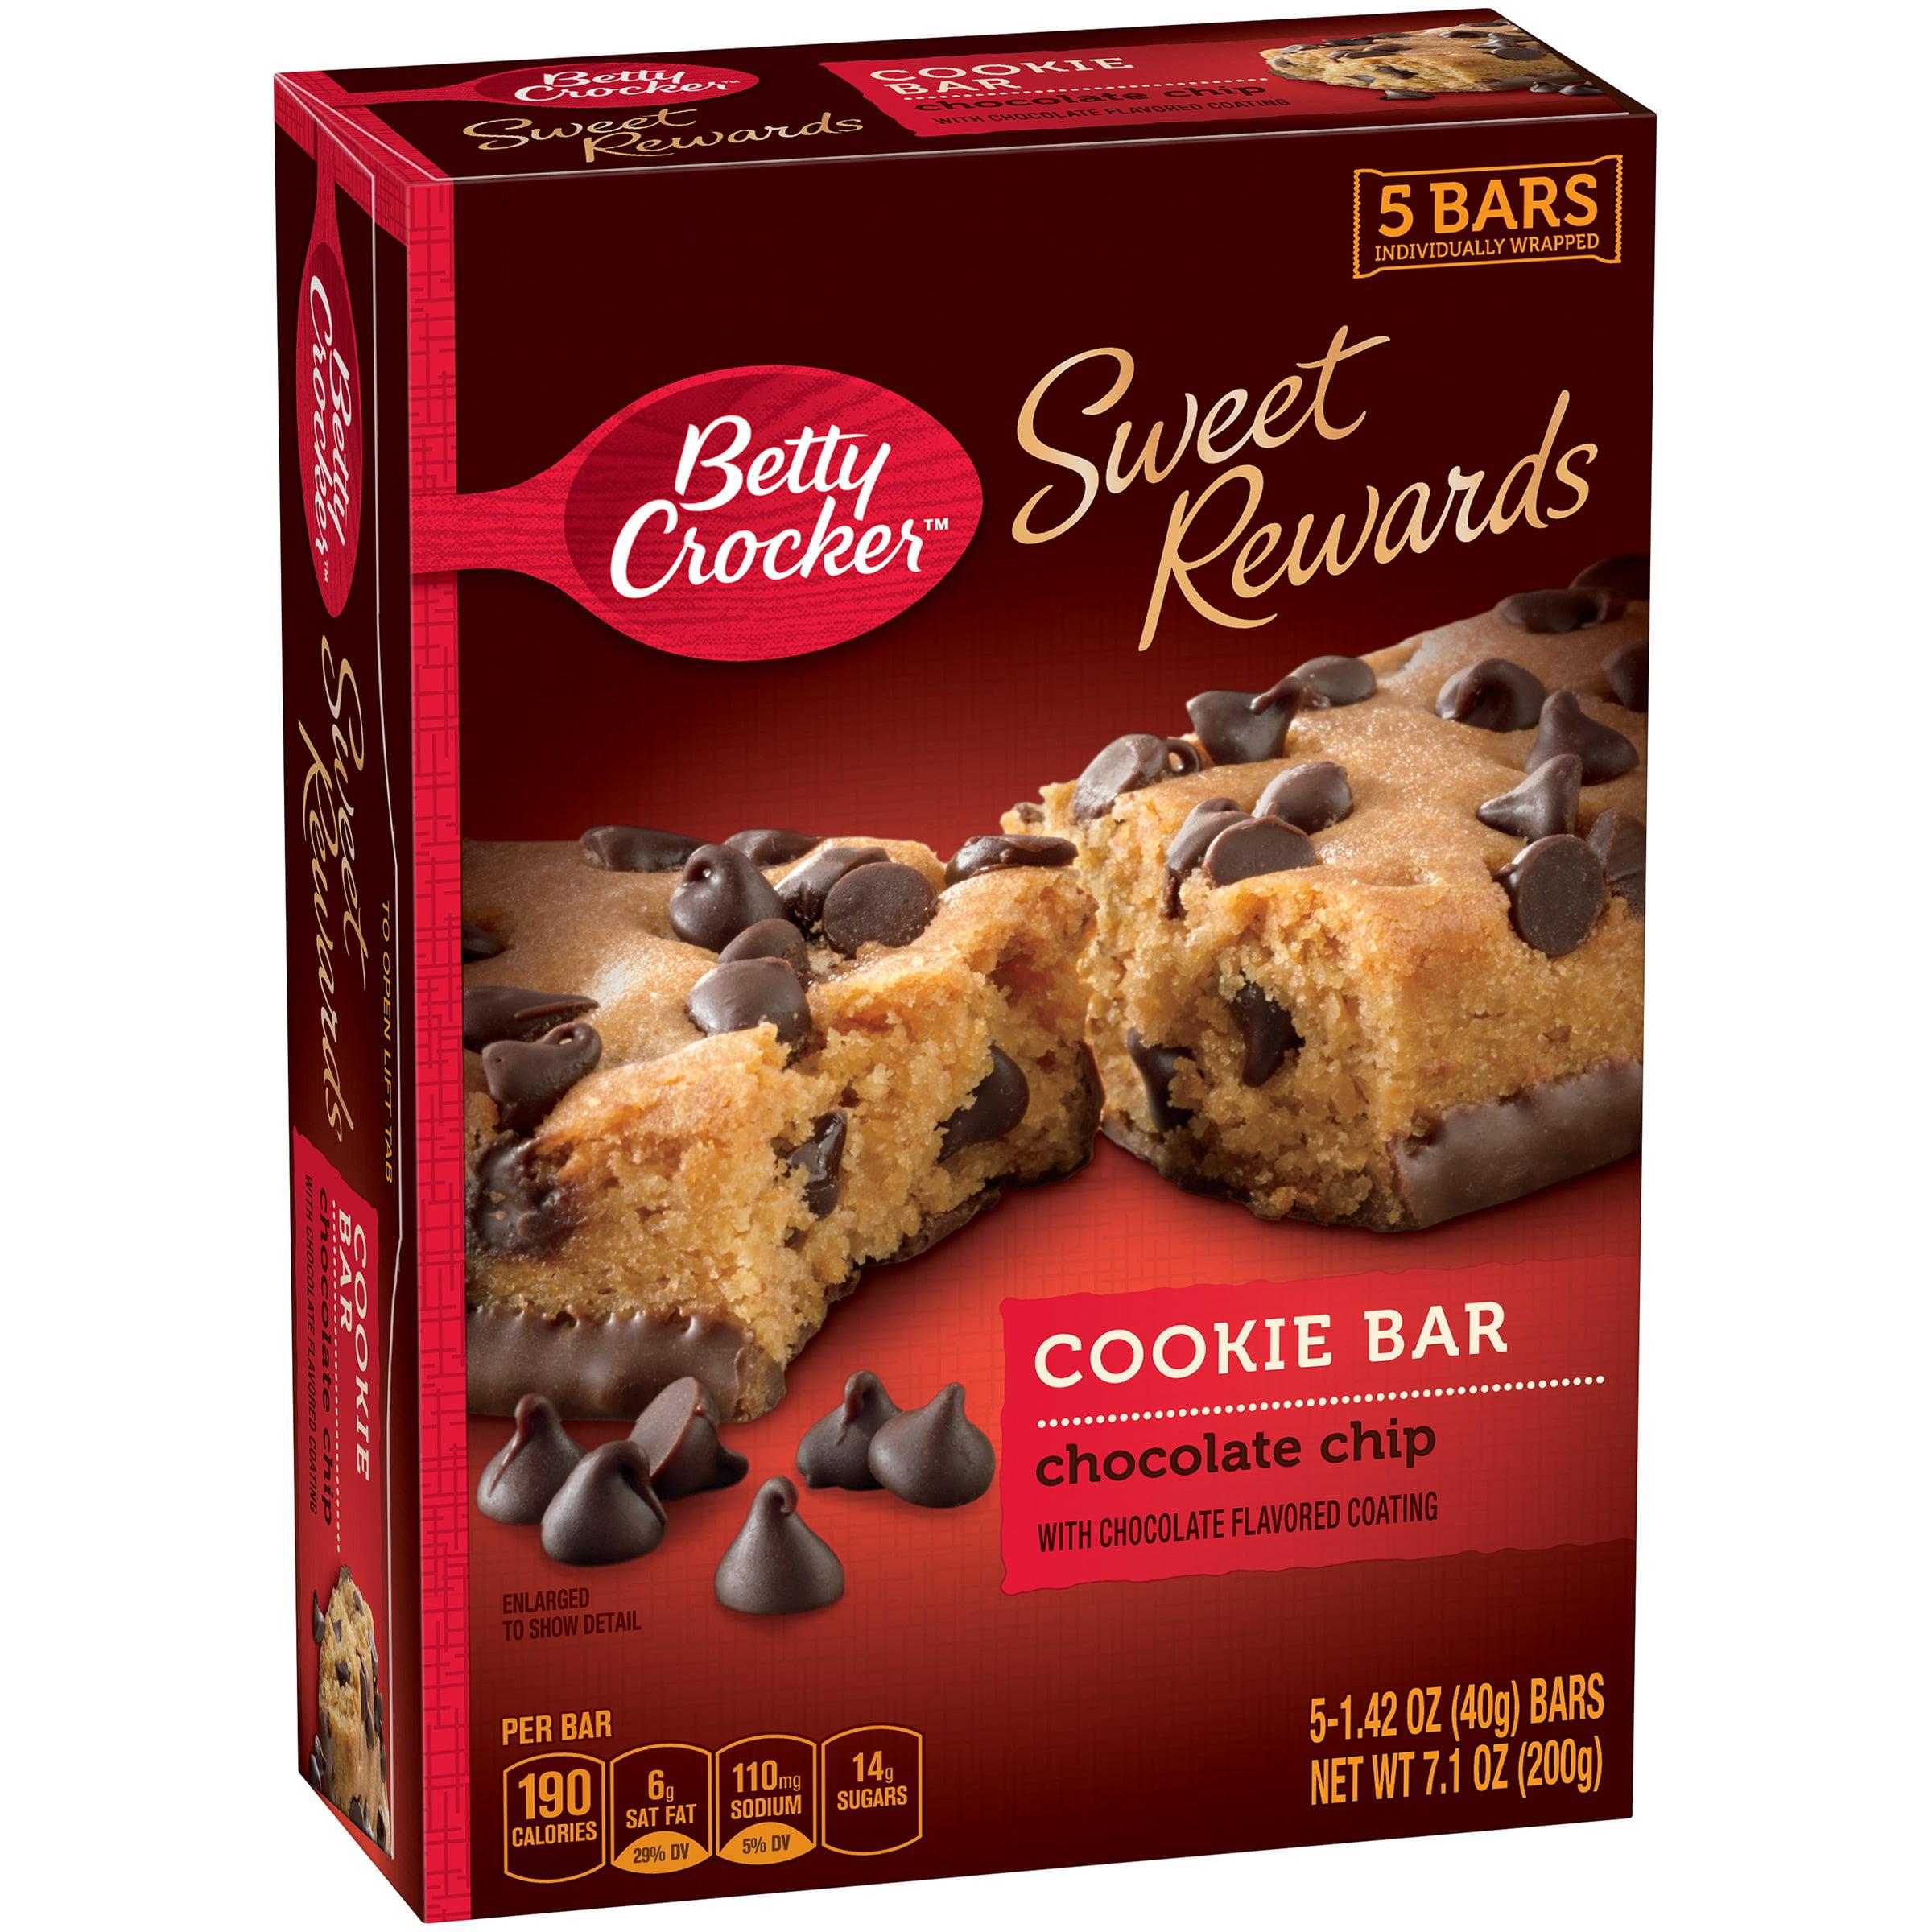 Betty Crocker Sweet Rewards Chocolate Chip Cookie Bars 5 ct Box ...